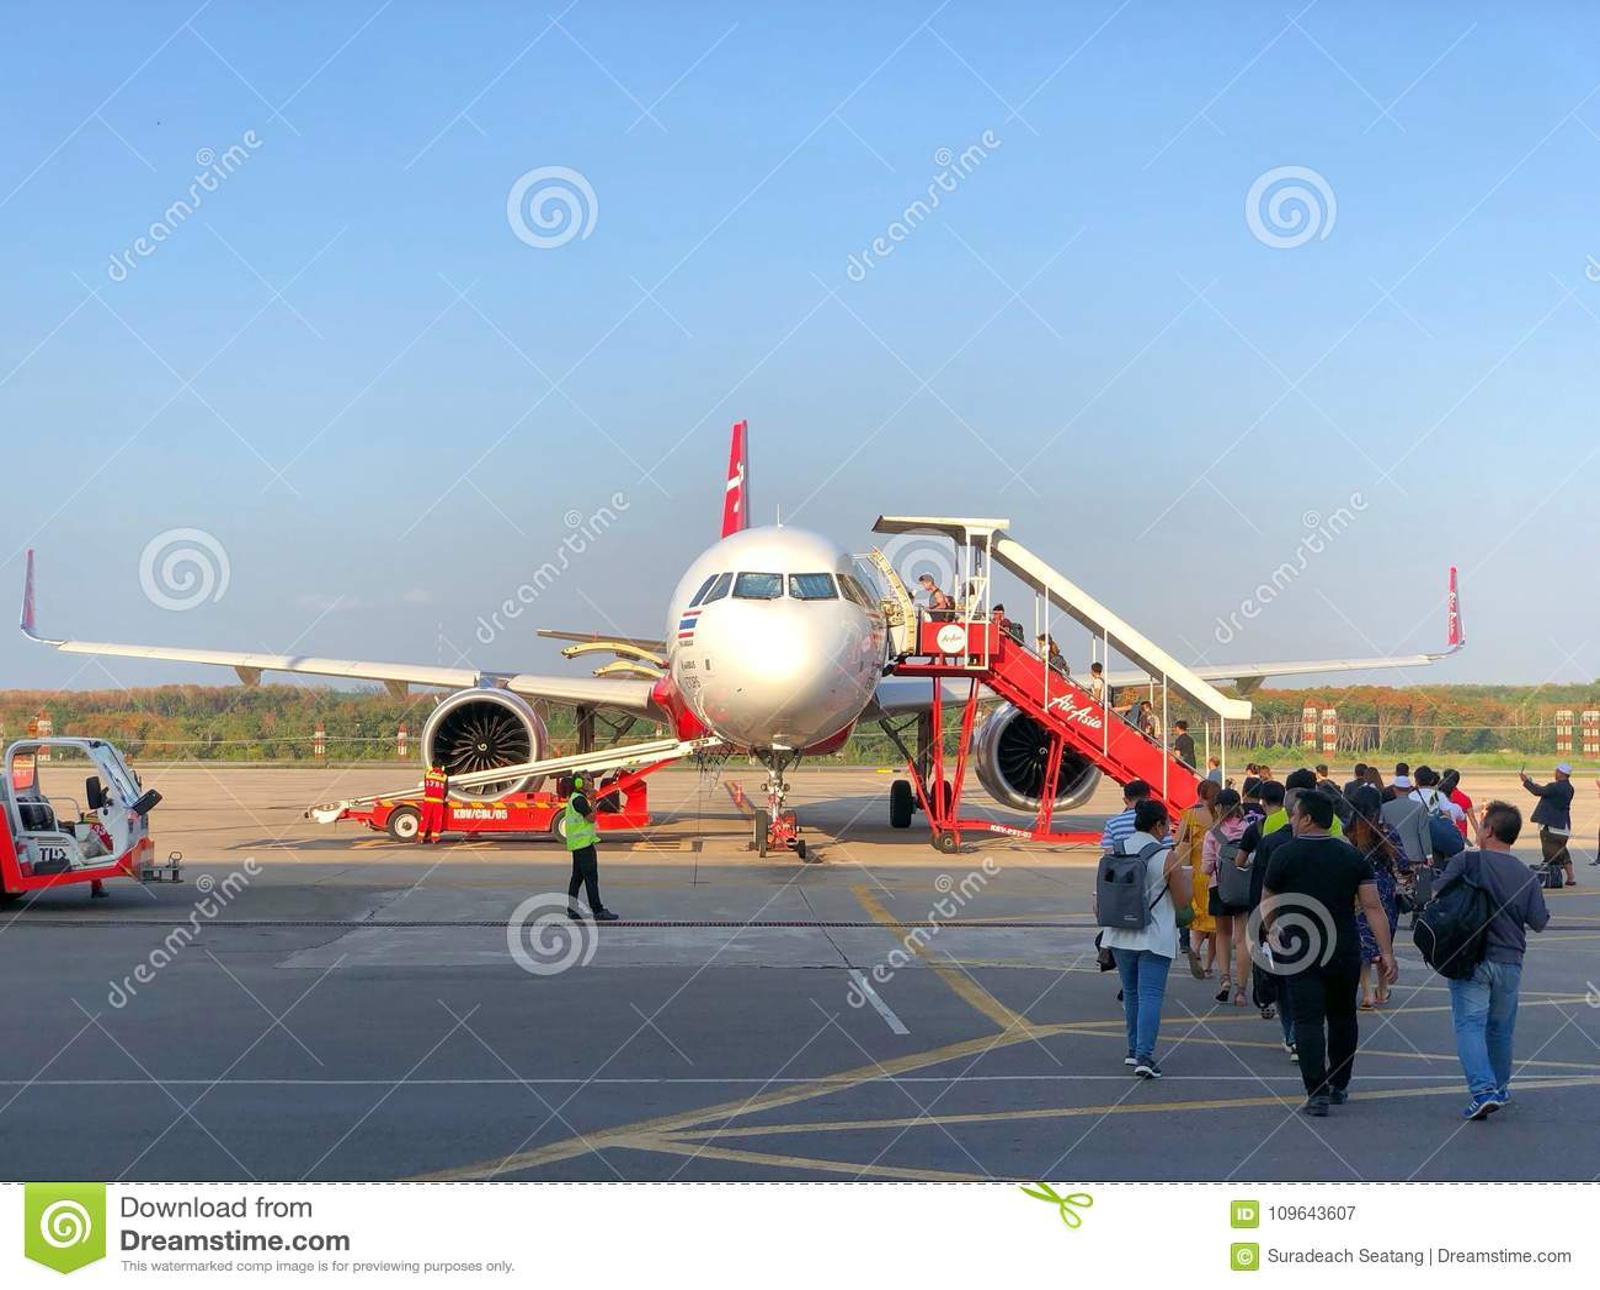 Many passengers walking to the airplane flight Krabi to Bangkok